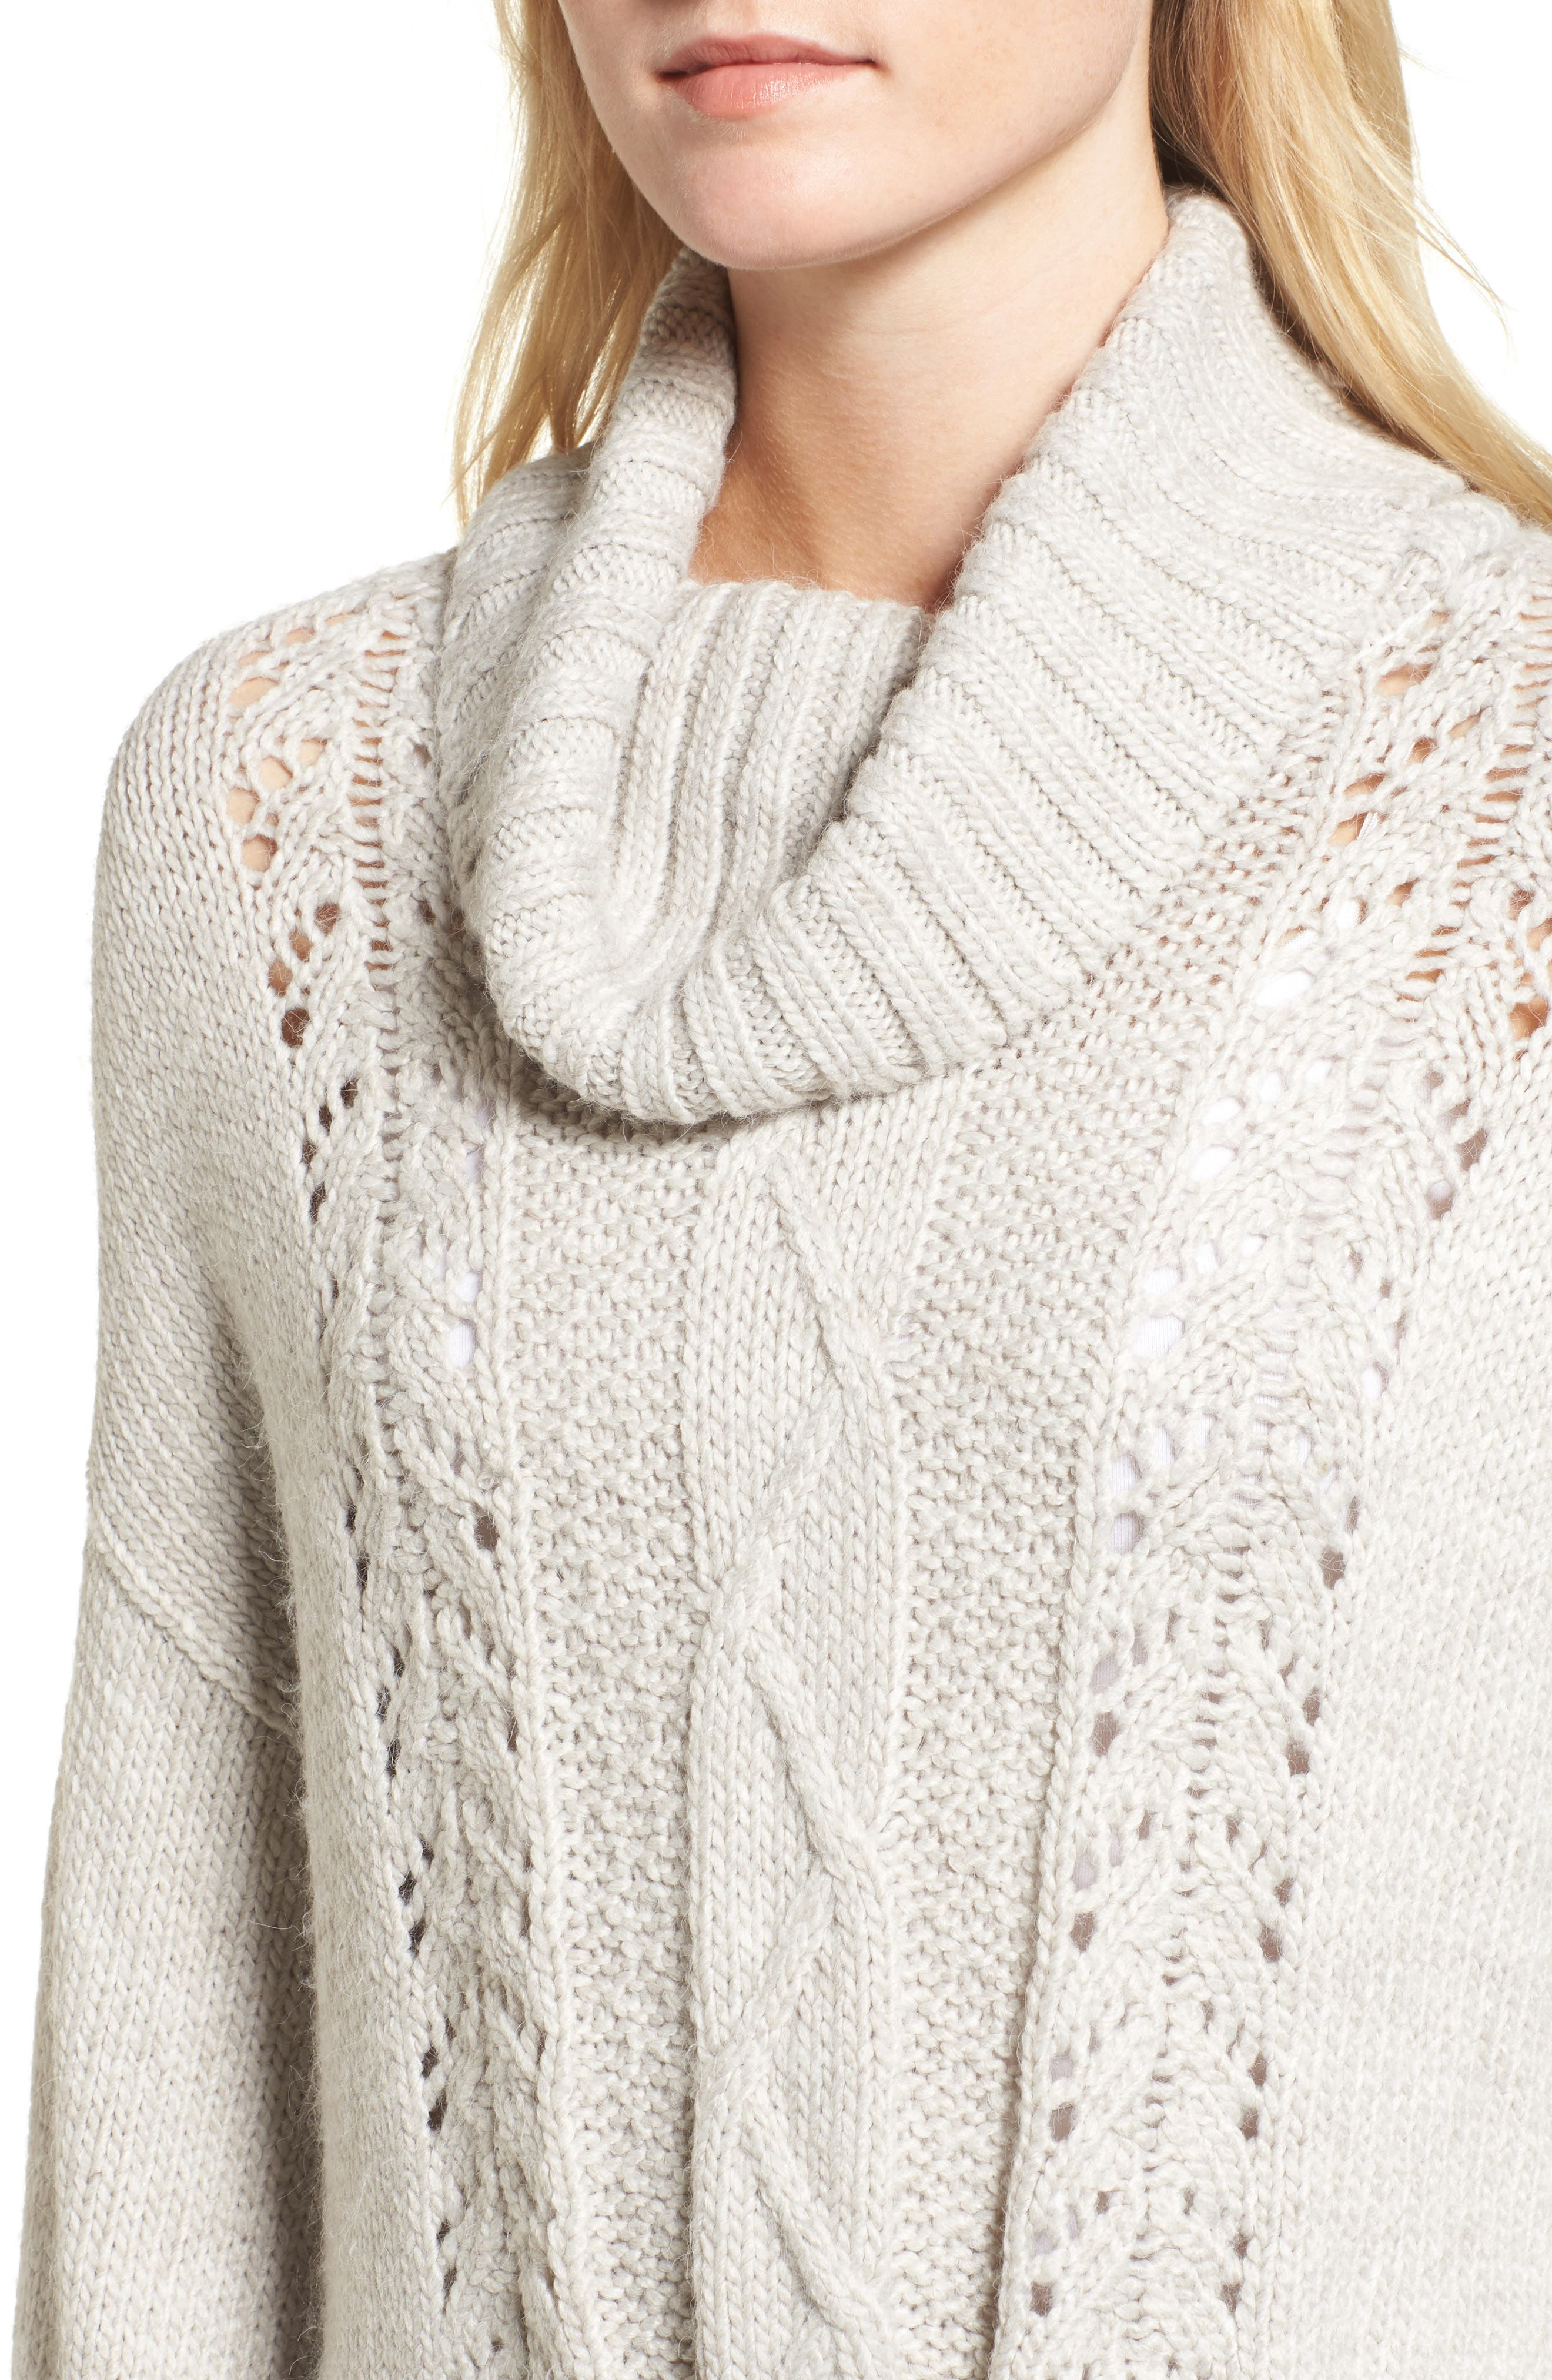 Prilla Fringe Cowl Neck Sweater,                             Alternate thumbnail 4, color,                             Latte